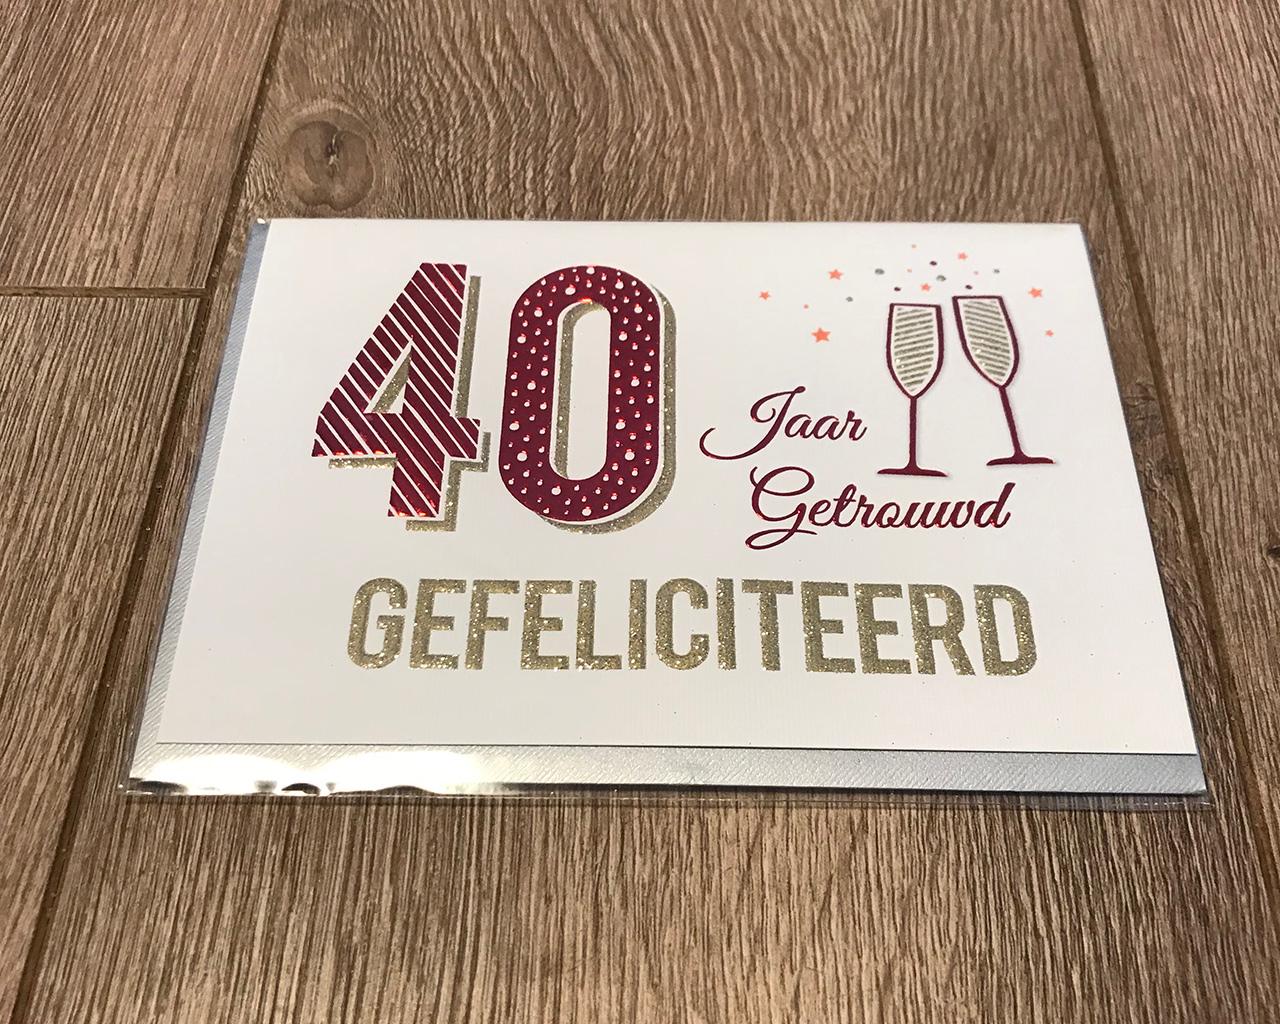 Populair 40 jaar getrouwd kaart - Bloem, Kaart en Kleur @JT94